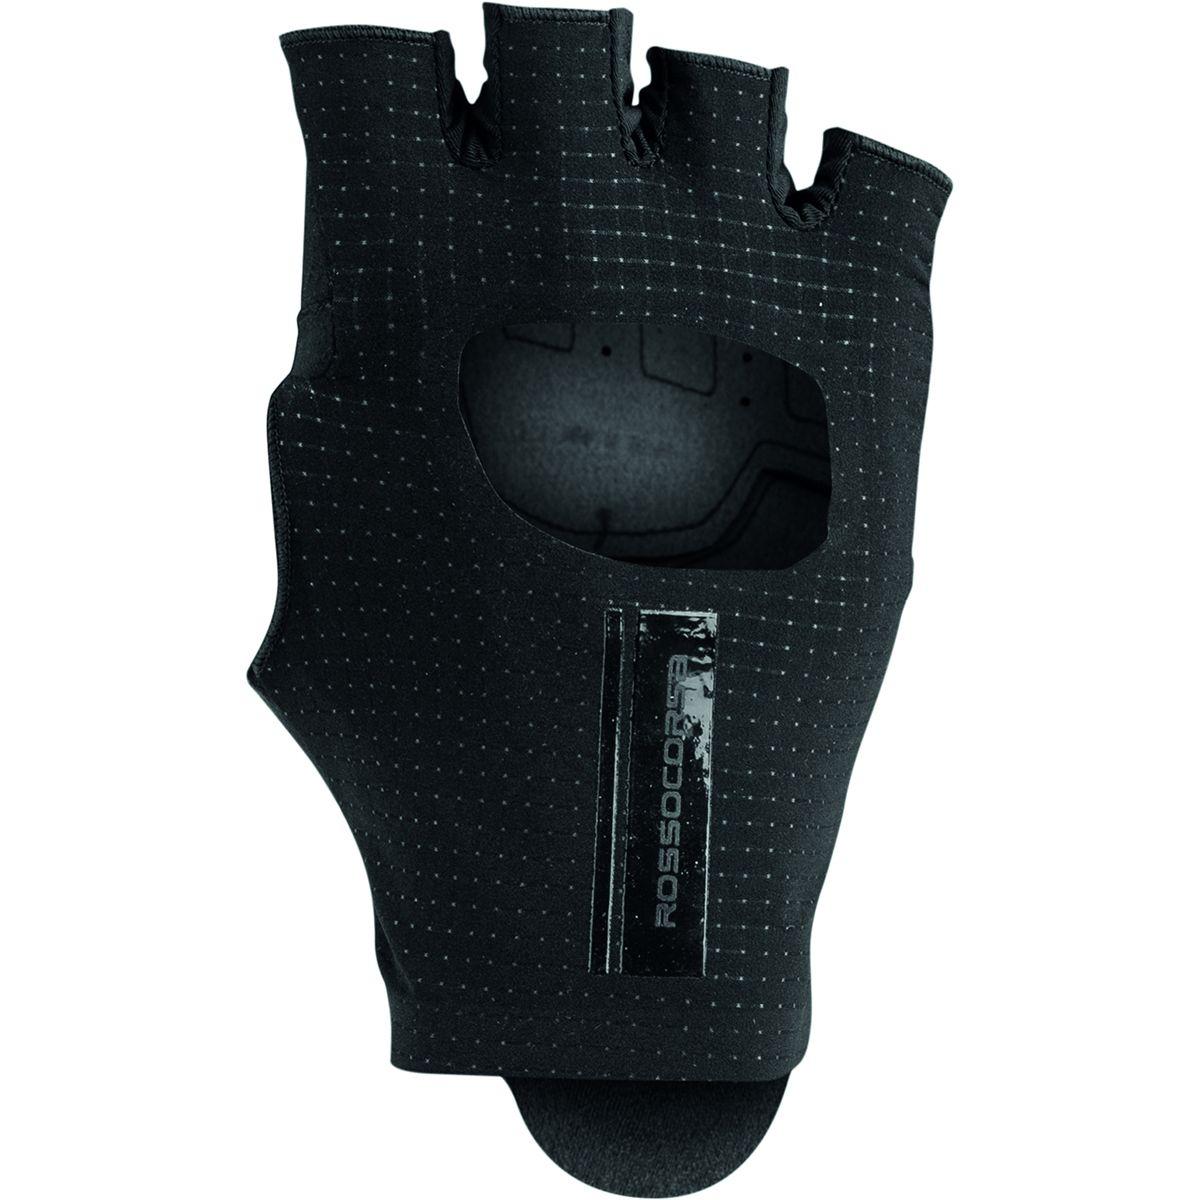 Castelli-Cabrio-Glove-Men-039-s miniature 11